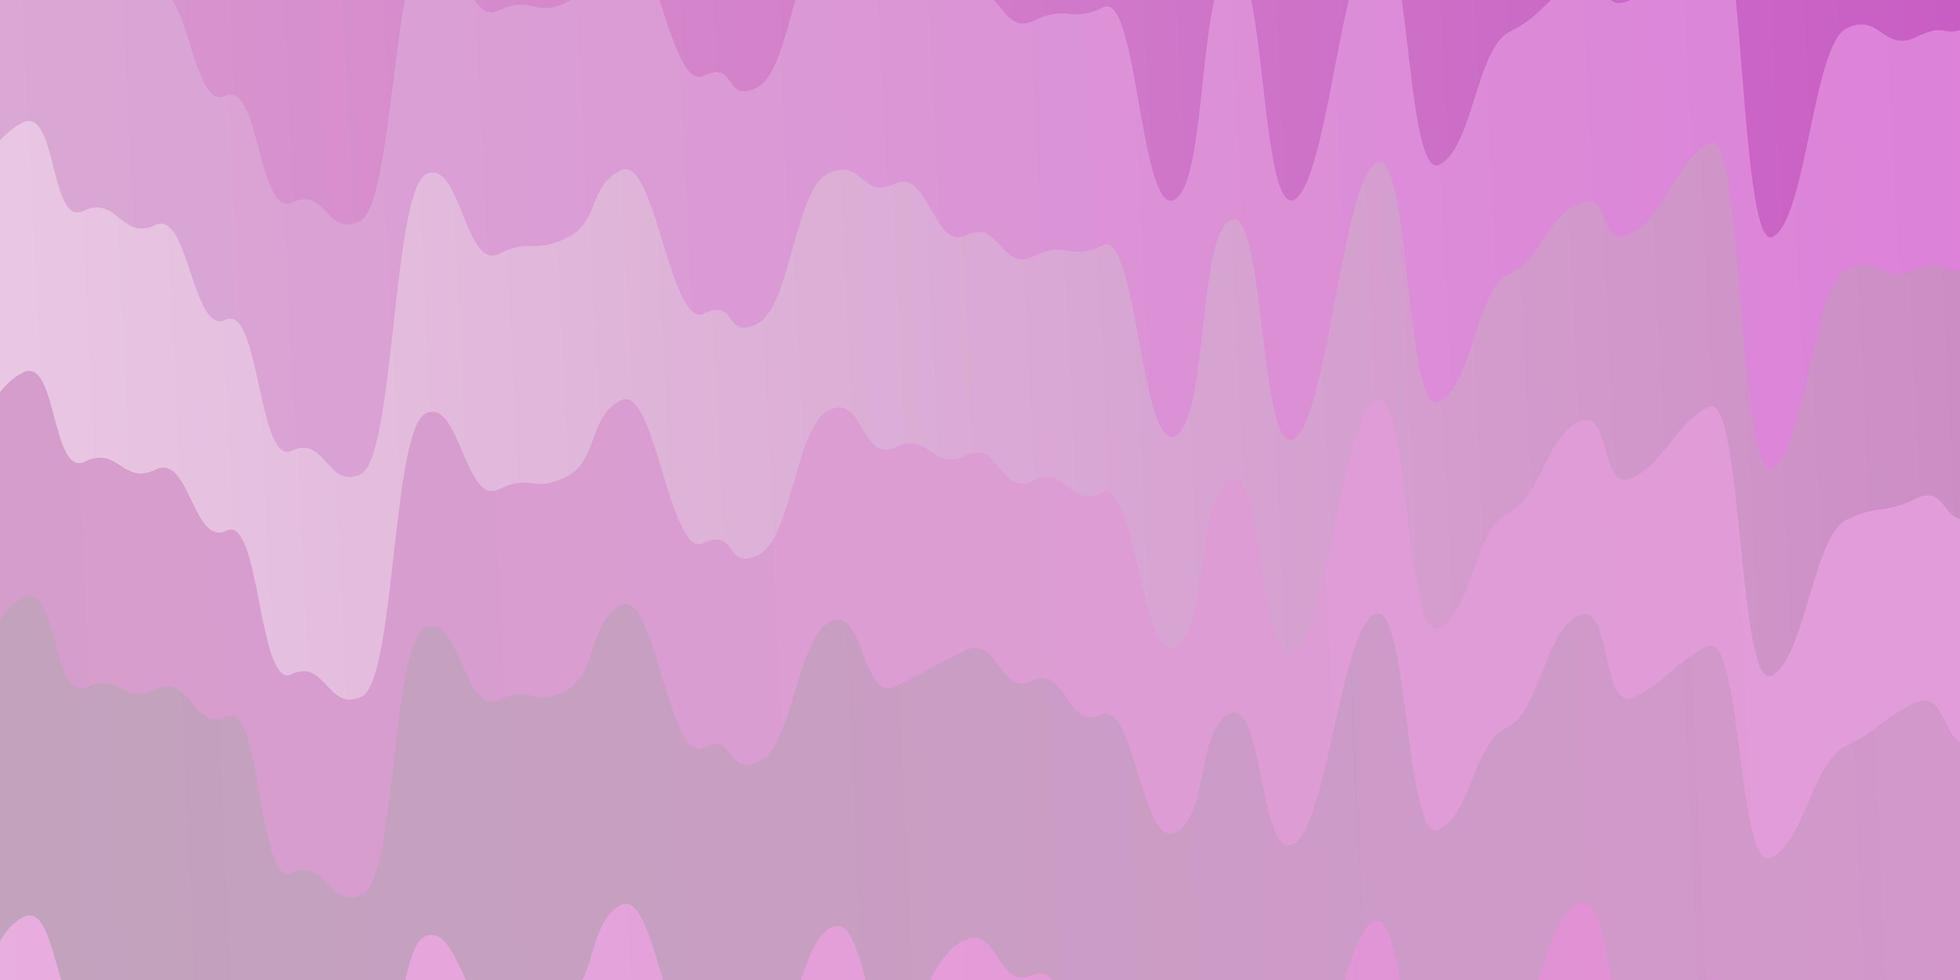 patrón de vector rosa claro con líneas torcidas.